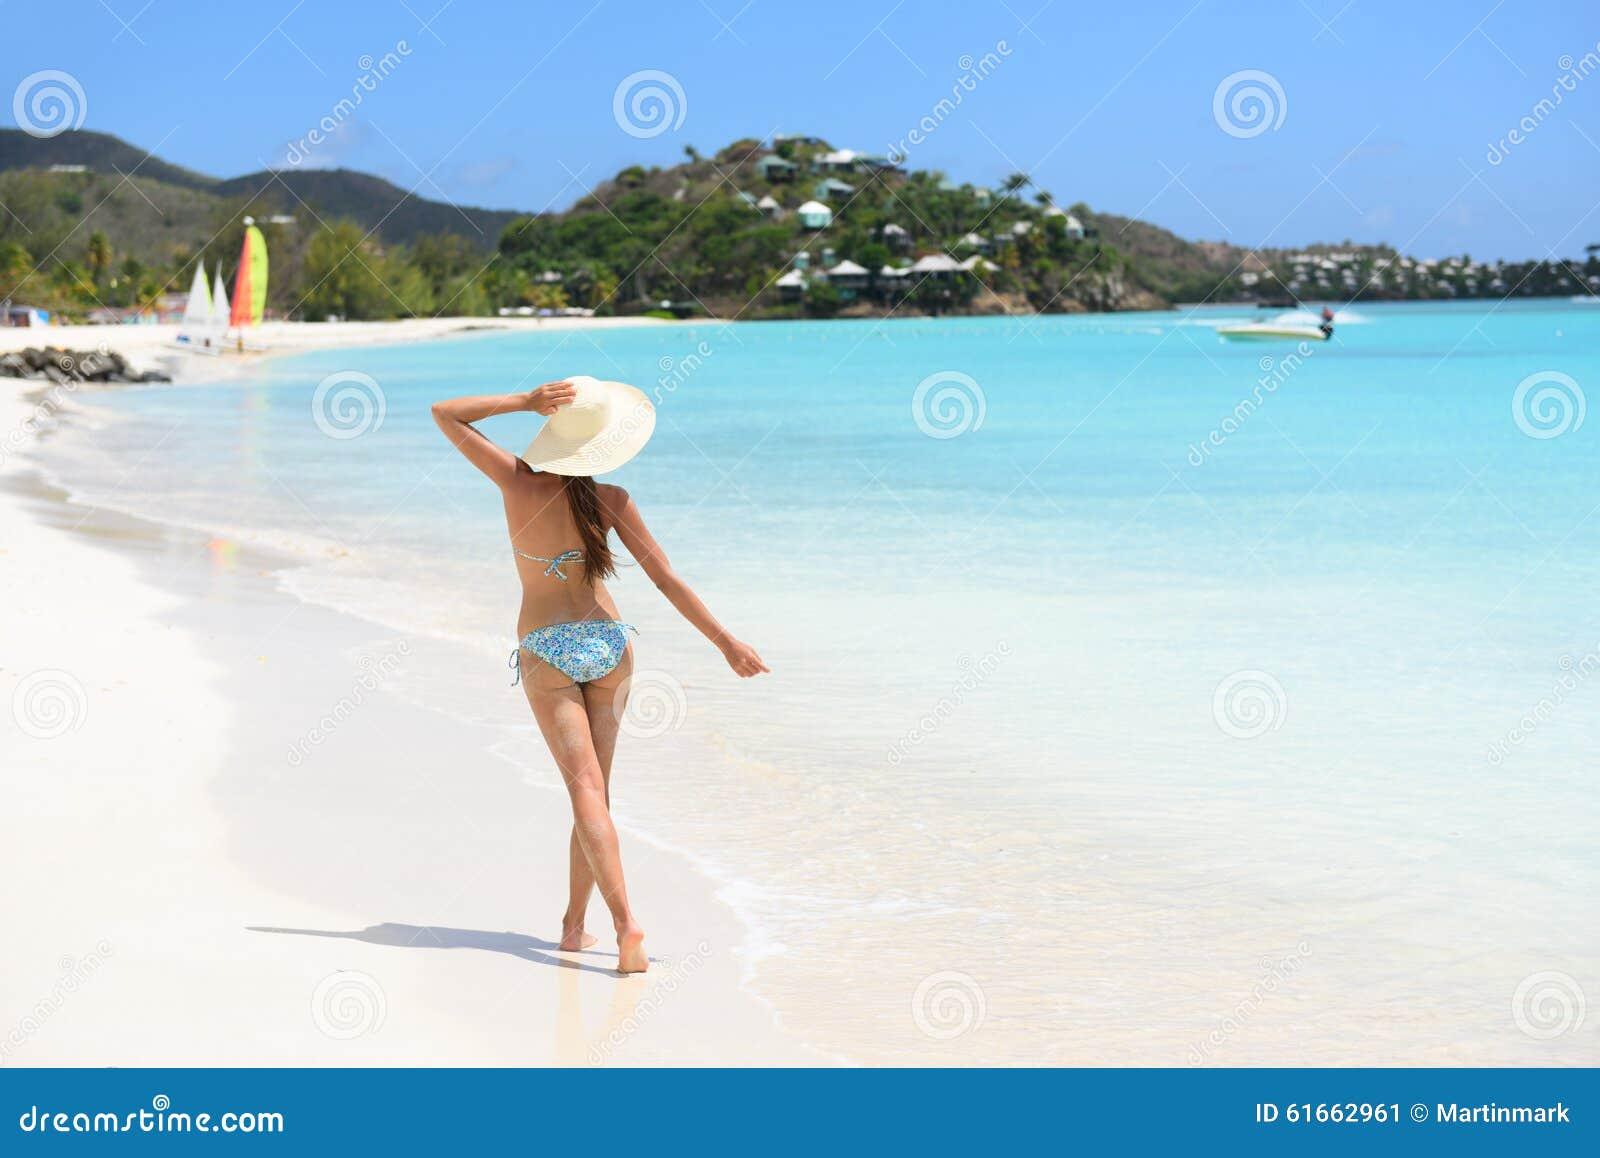 Beach Travel Woman Bikini Wearing Sun Hat Walking Stock Image ... f8decc278d5